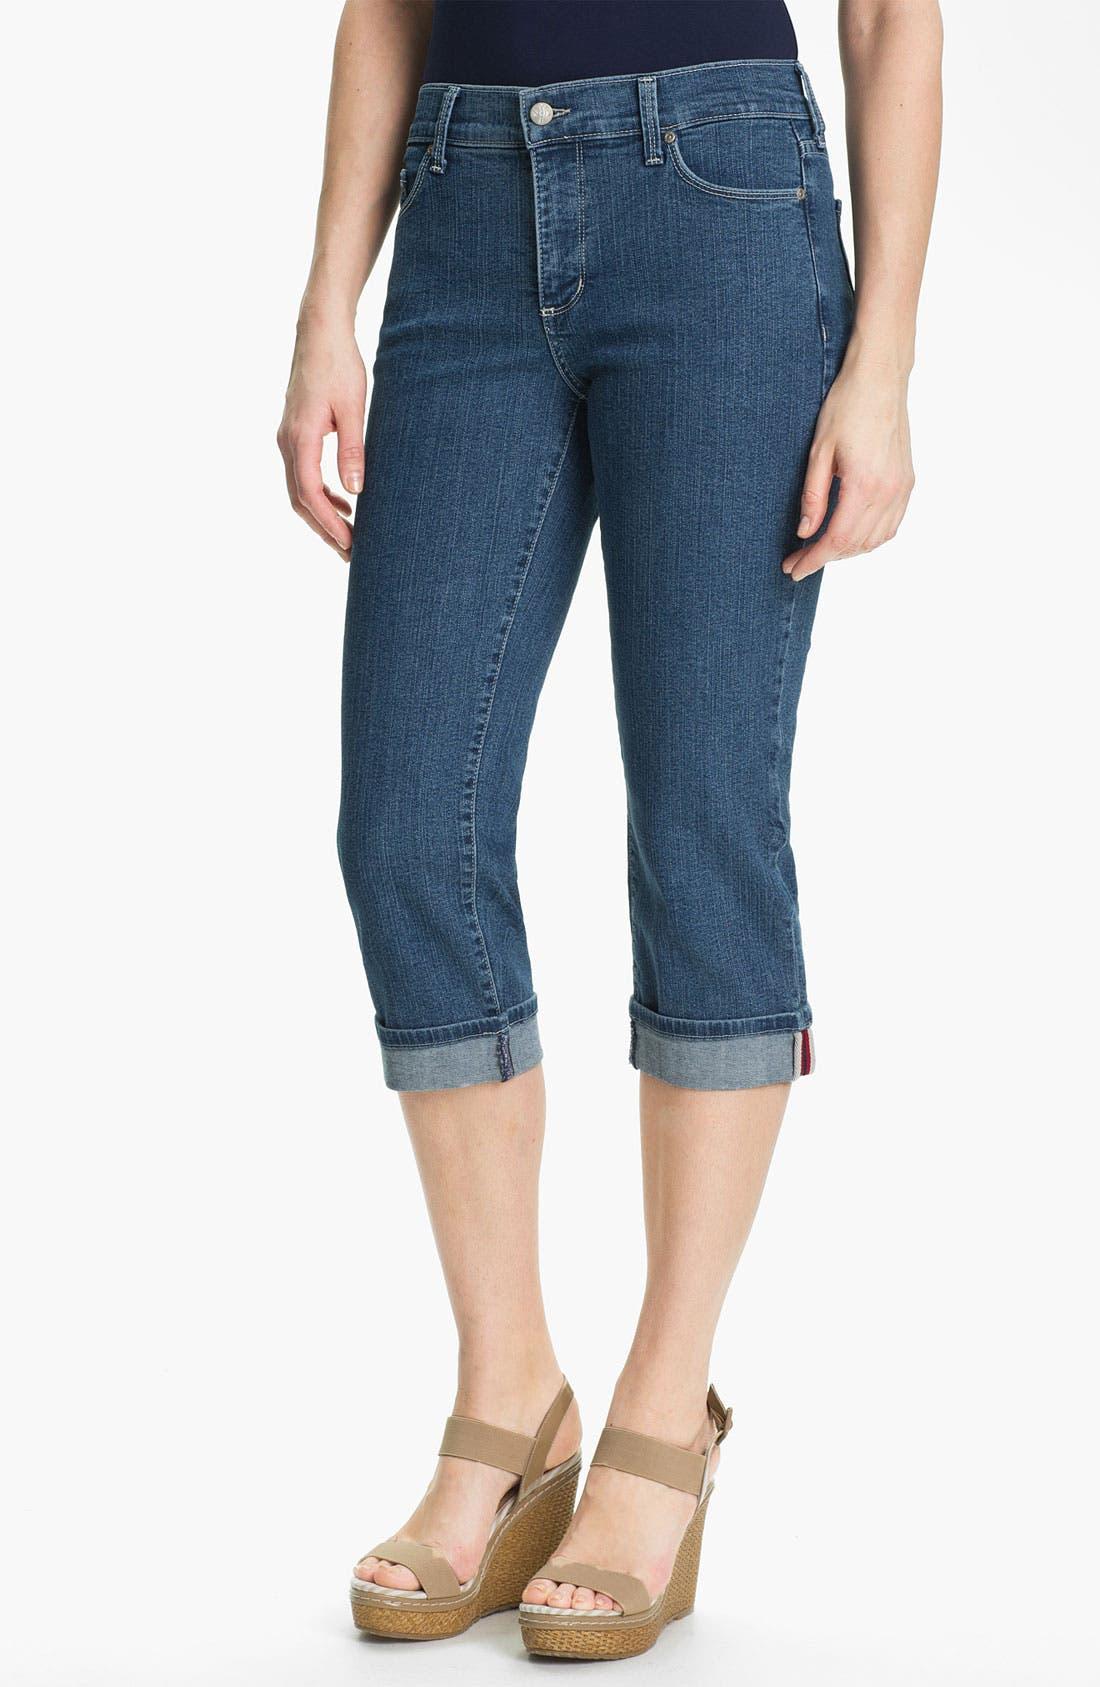 Alternate Image 1 Selected - NYDJ 'Edna' Cuff Crop Jeans